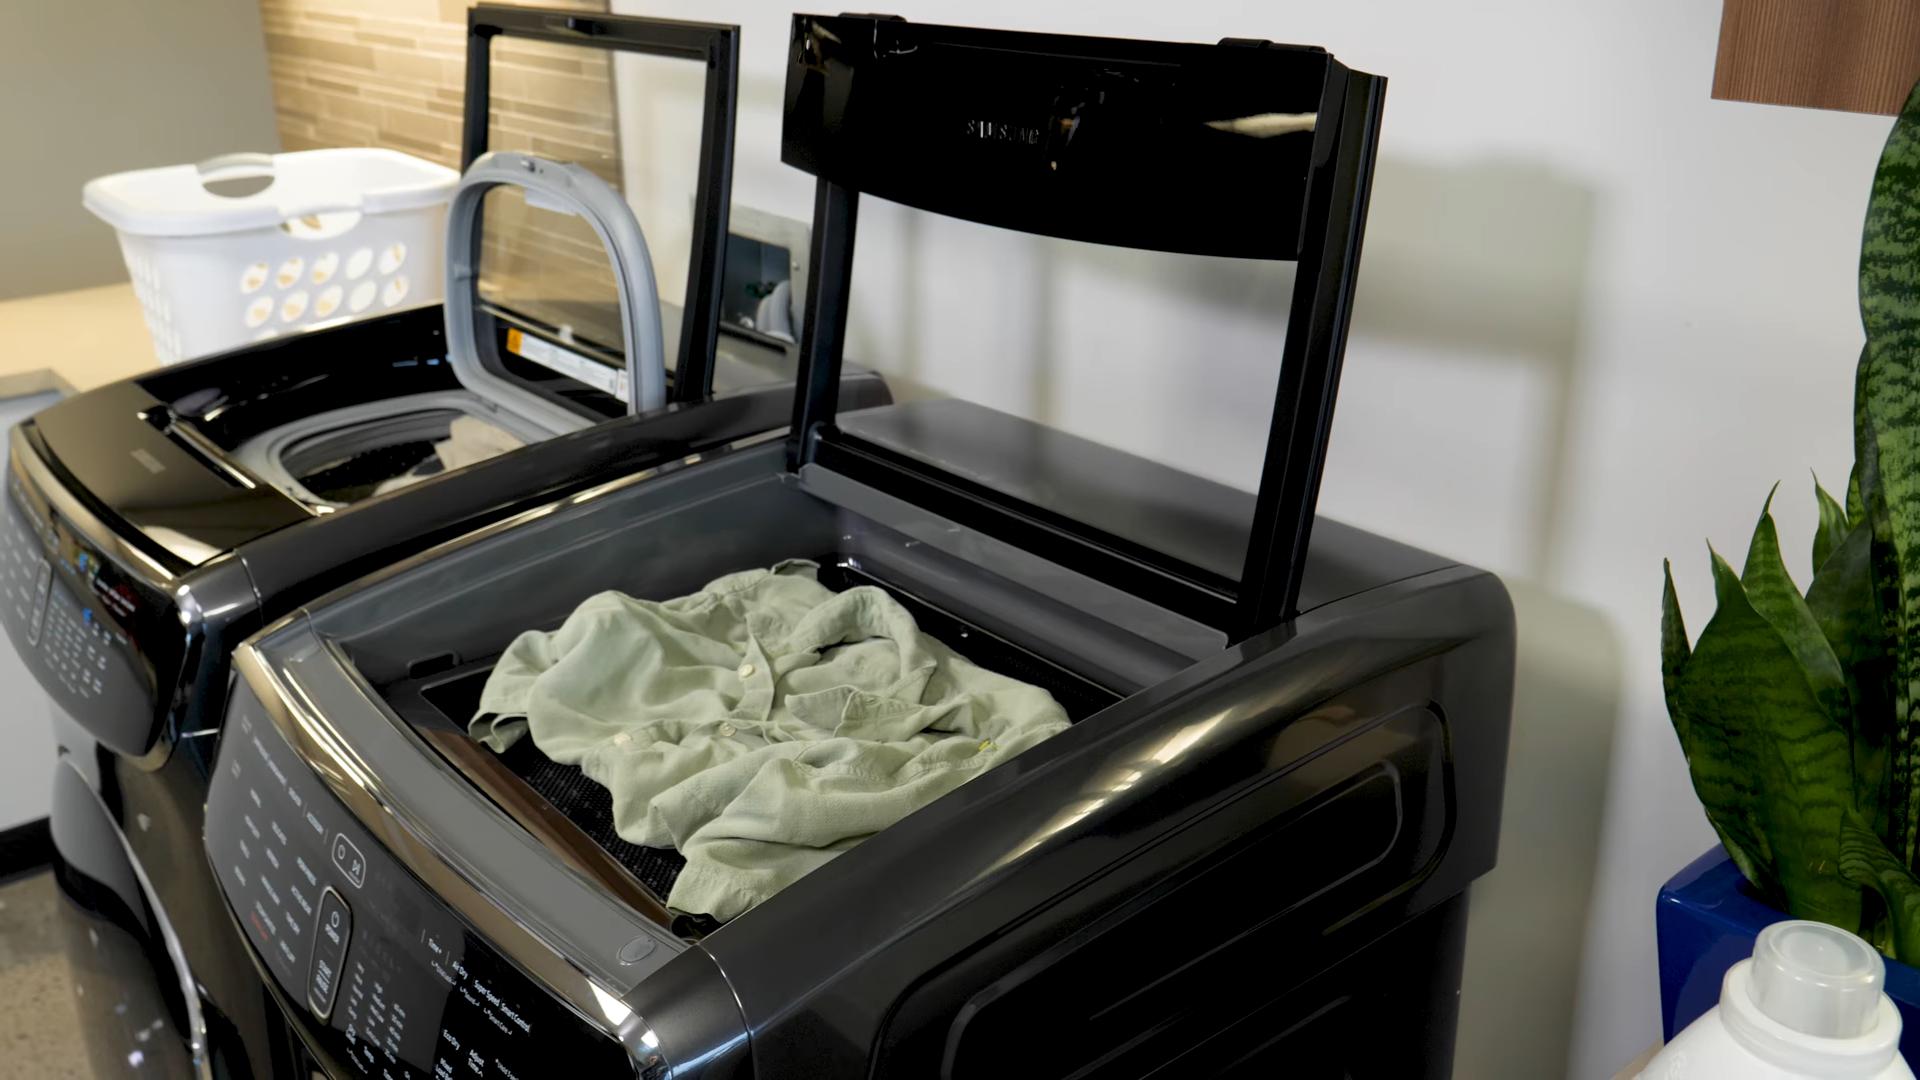 Ge Washing Machine Drain Hose Washing Machine Fill Hose Lg Top Loader Washing Machine In 2020 Washing Machine Drain Hose Washing Machine Black Hoover Washing Machine